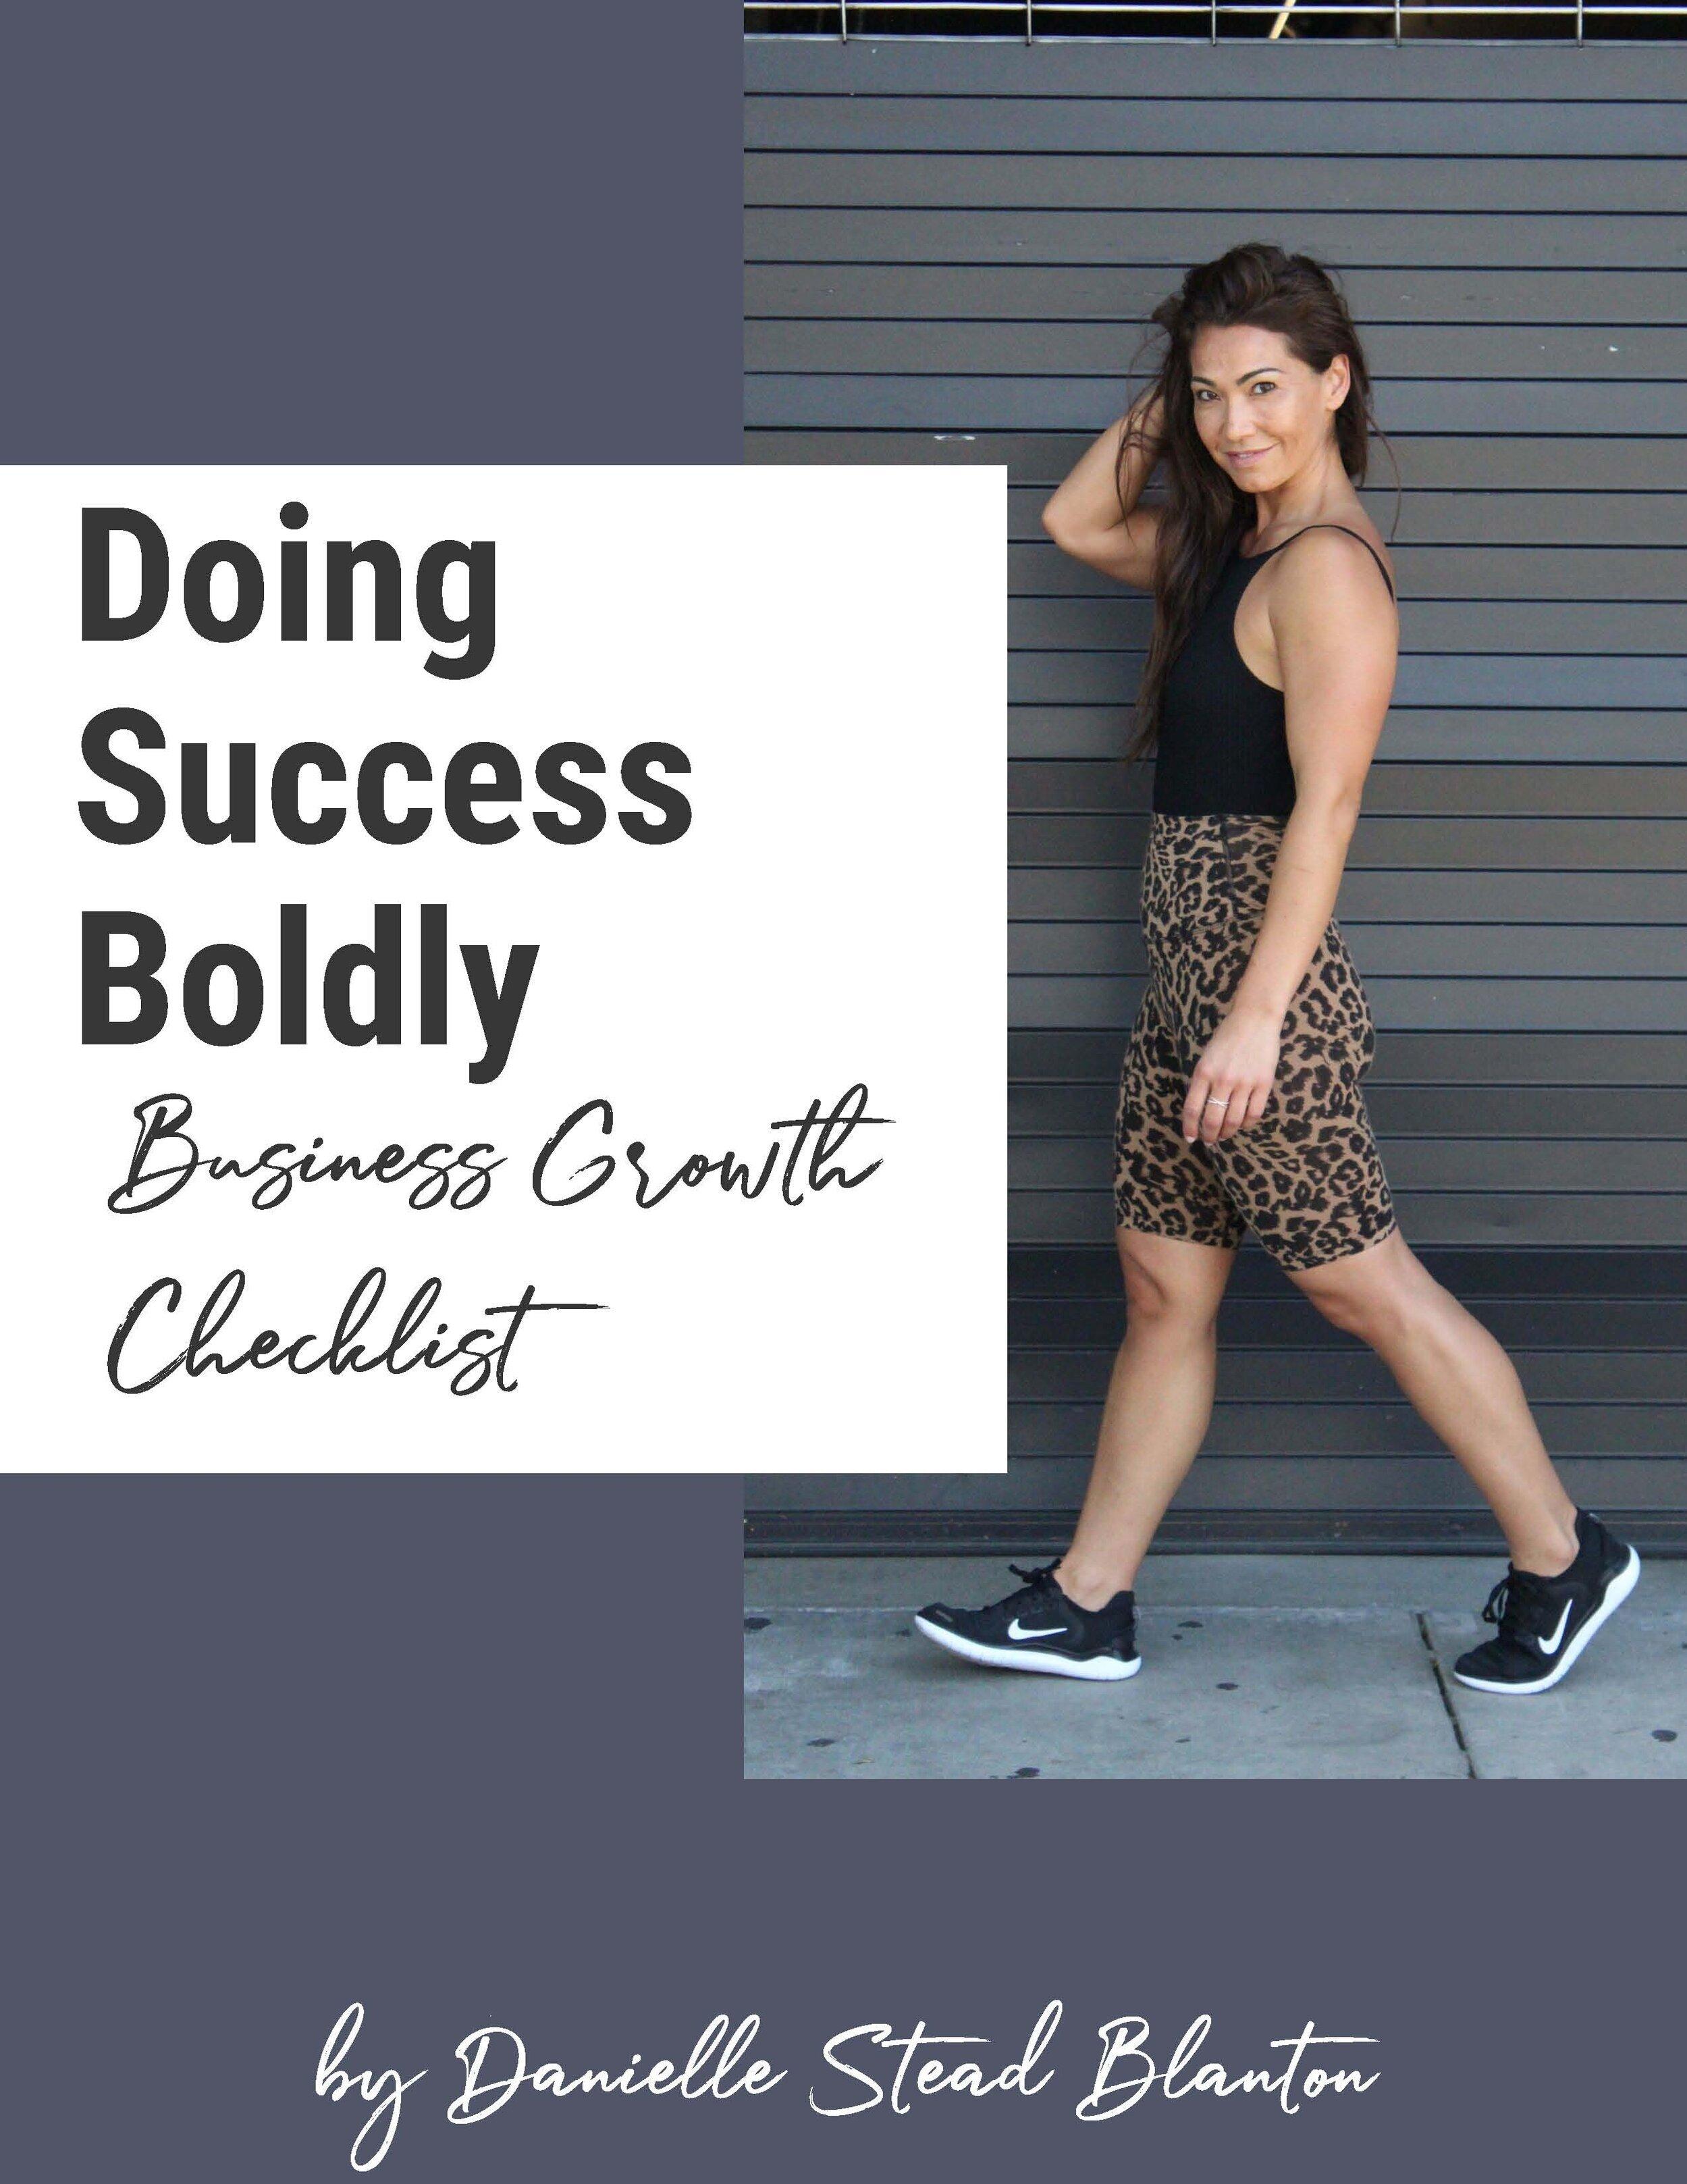 Business+Growth+Checklist+pg1.jpg